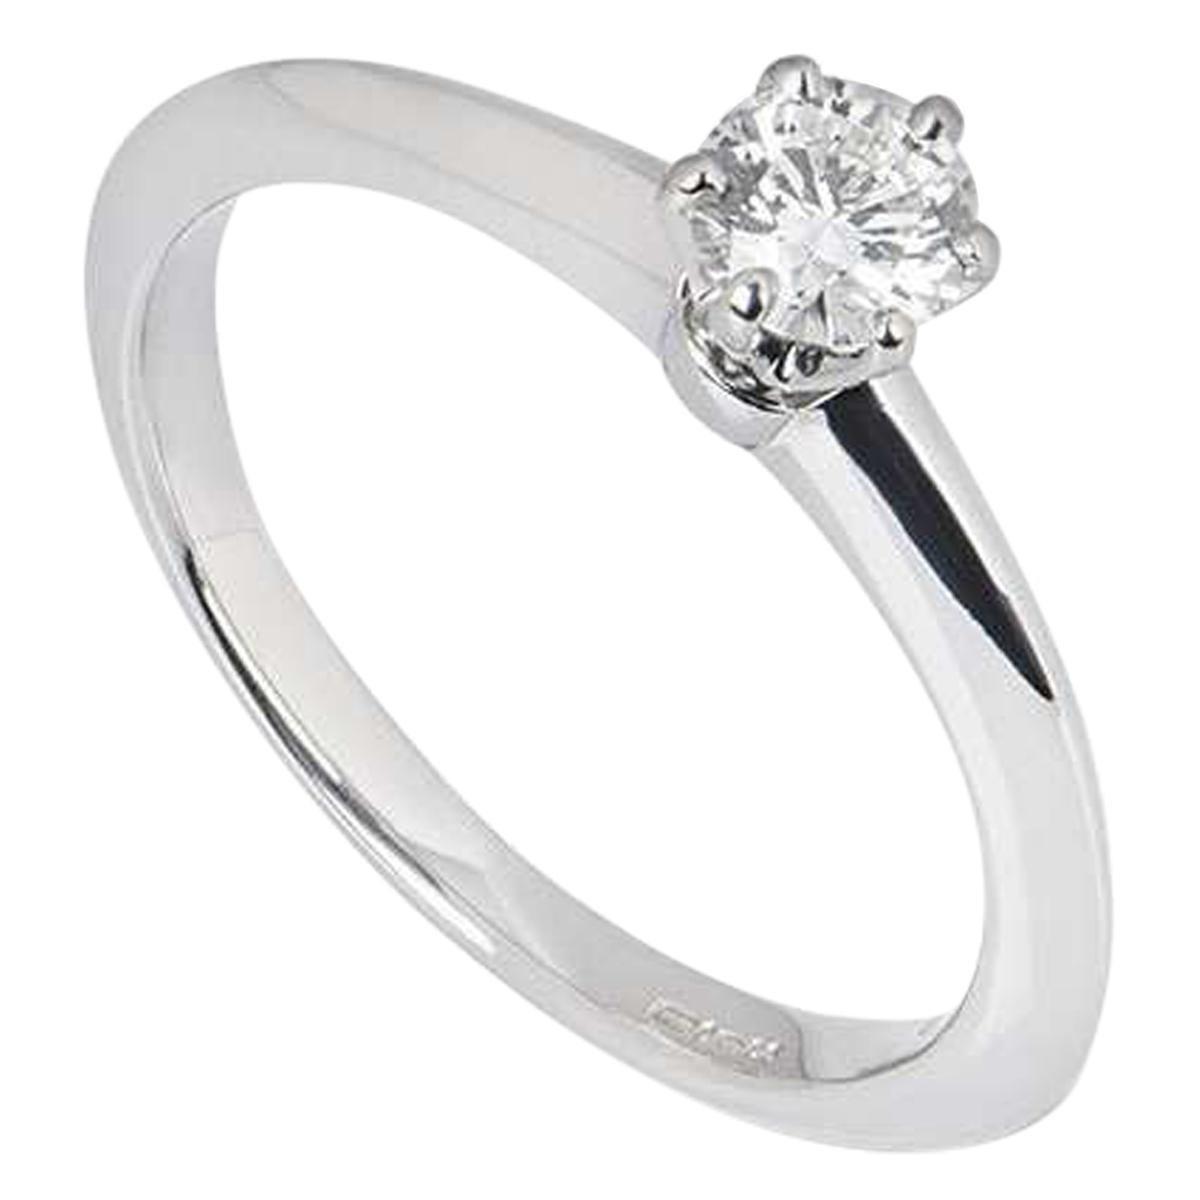 Tiffany & Co. Round Brilliant Cut Diamond Solitaire Engagement Ring 0.32 Carat